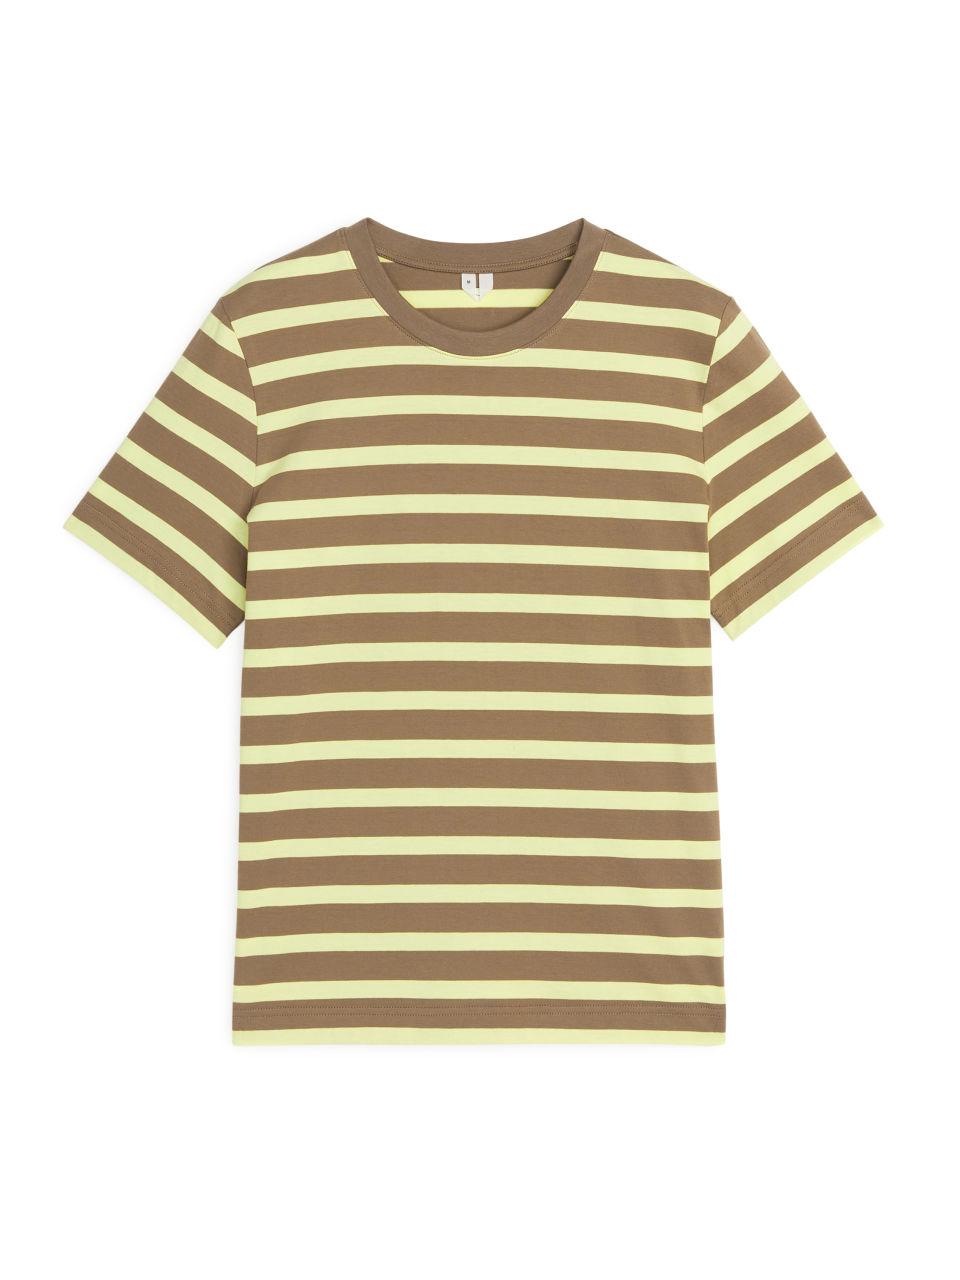 Crew-Neck Striped T-shirt - Yellow